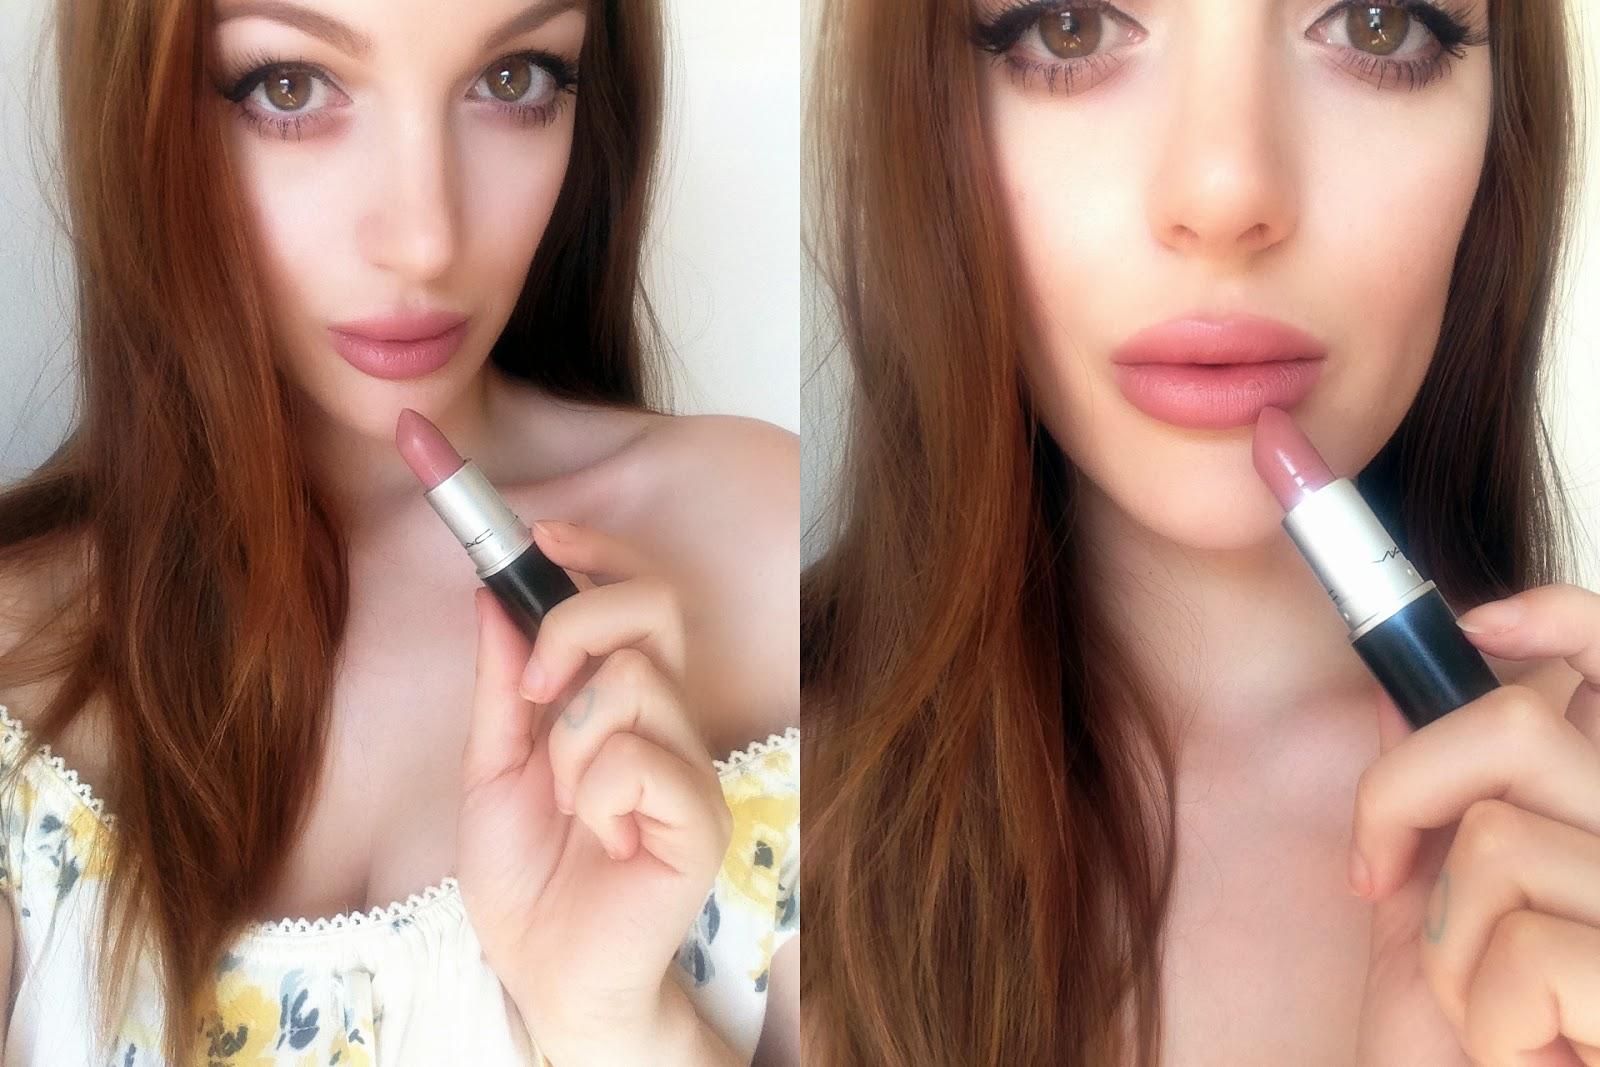 Rosy Cherrington: MAC Cremesheen Lipstick in Modesty